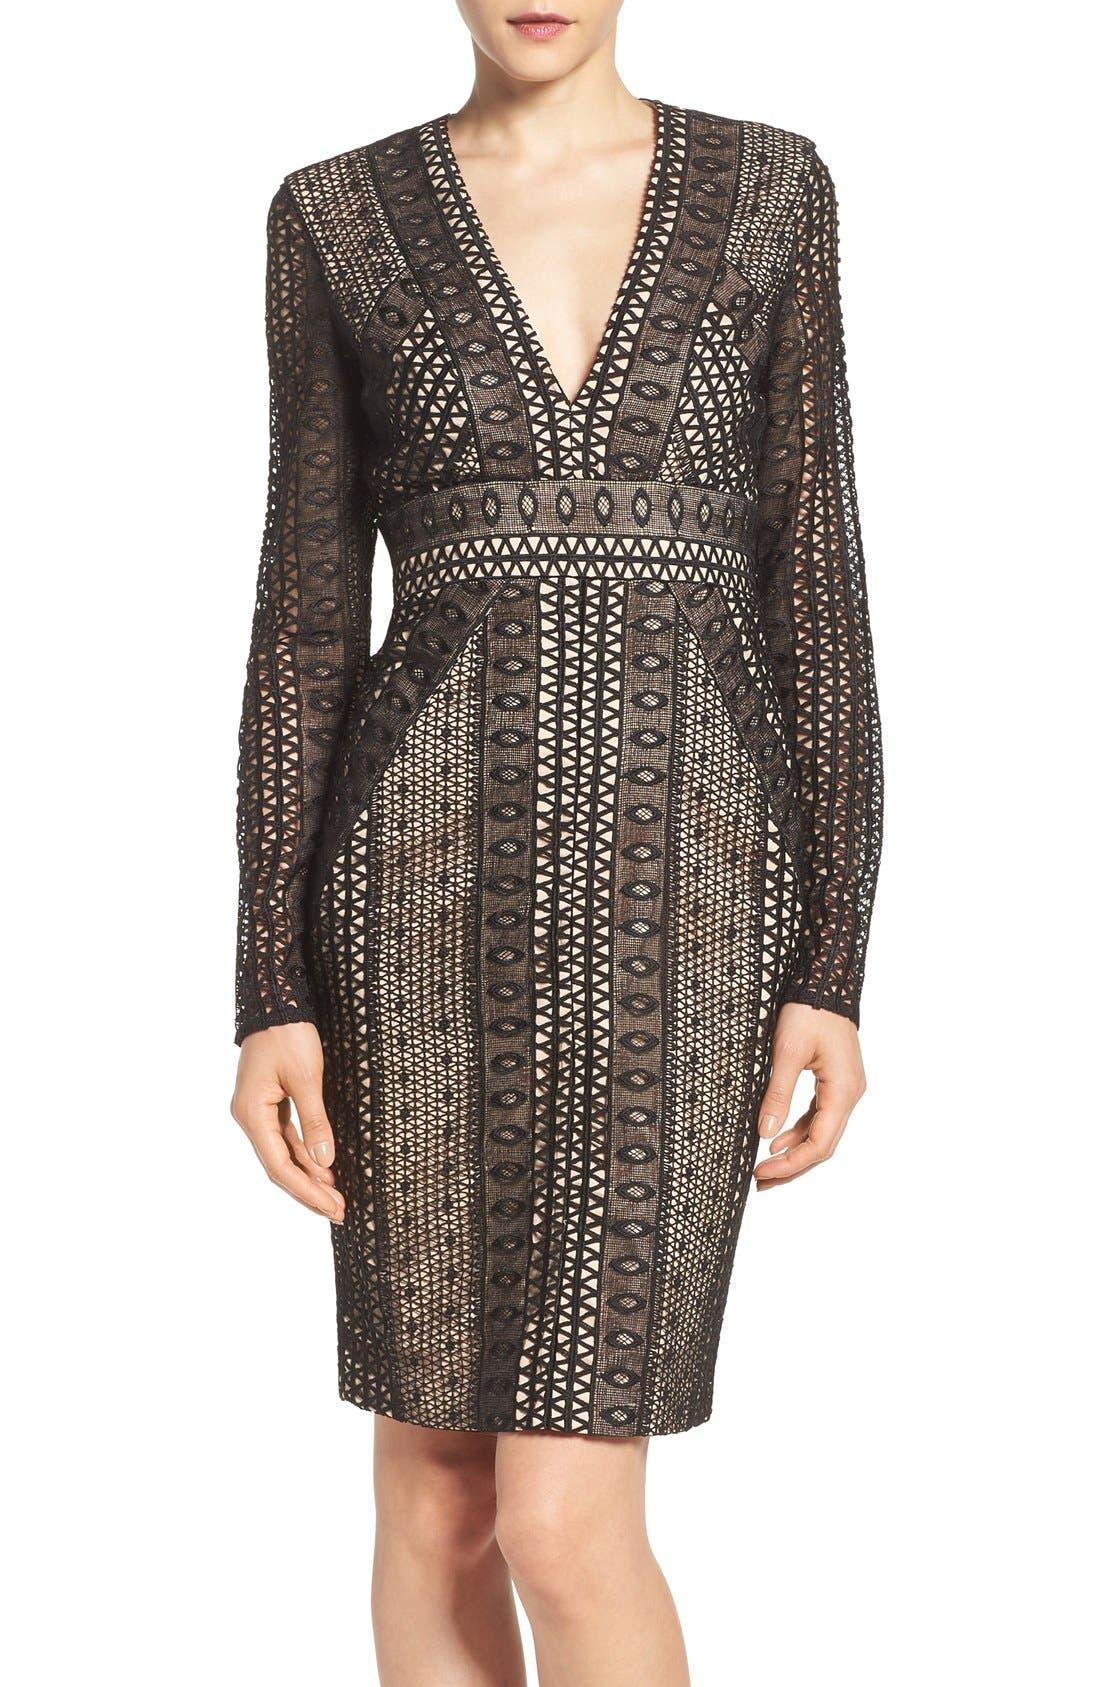 Alternate Image 1 Selected - Bardot Allegra Lace Sheath Dress